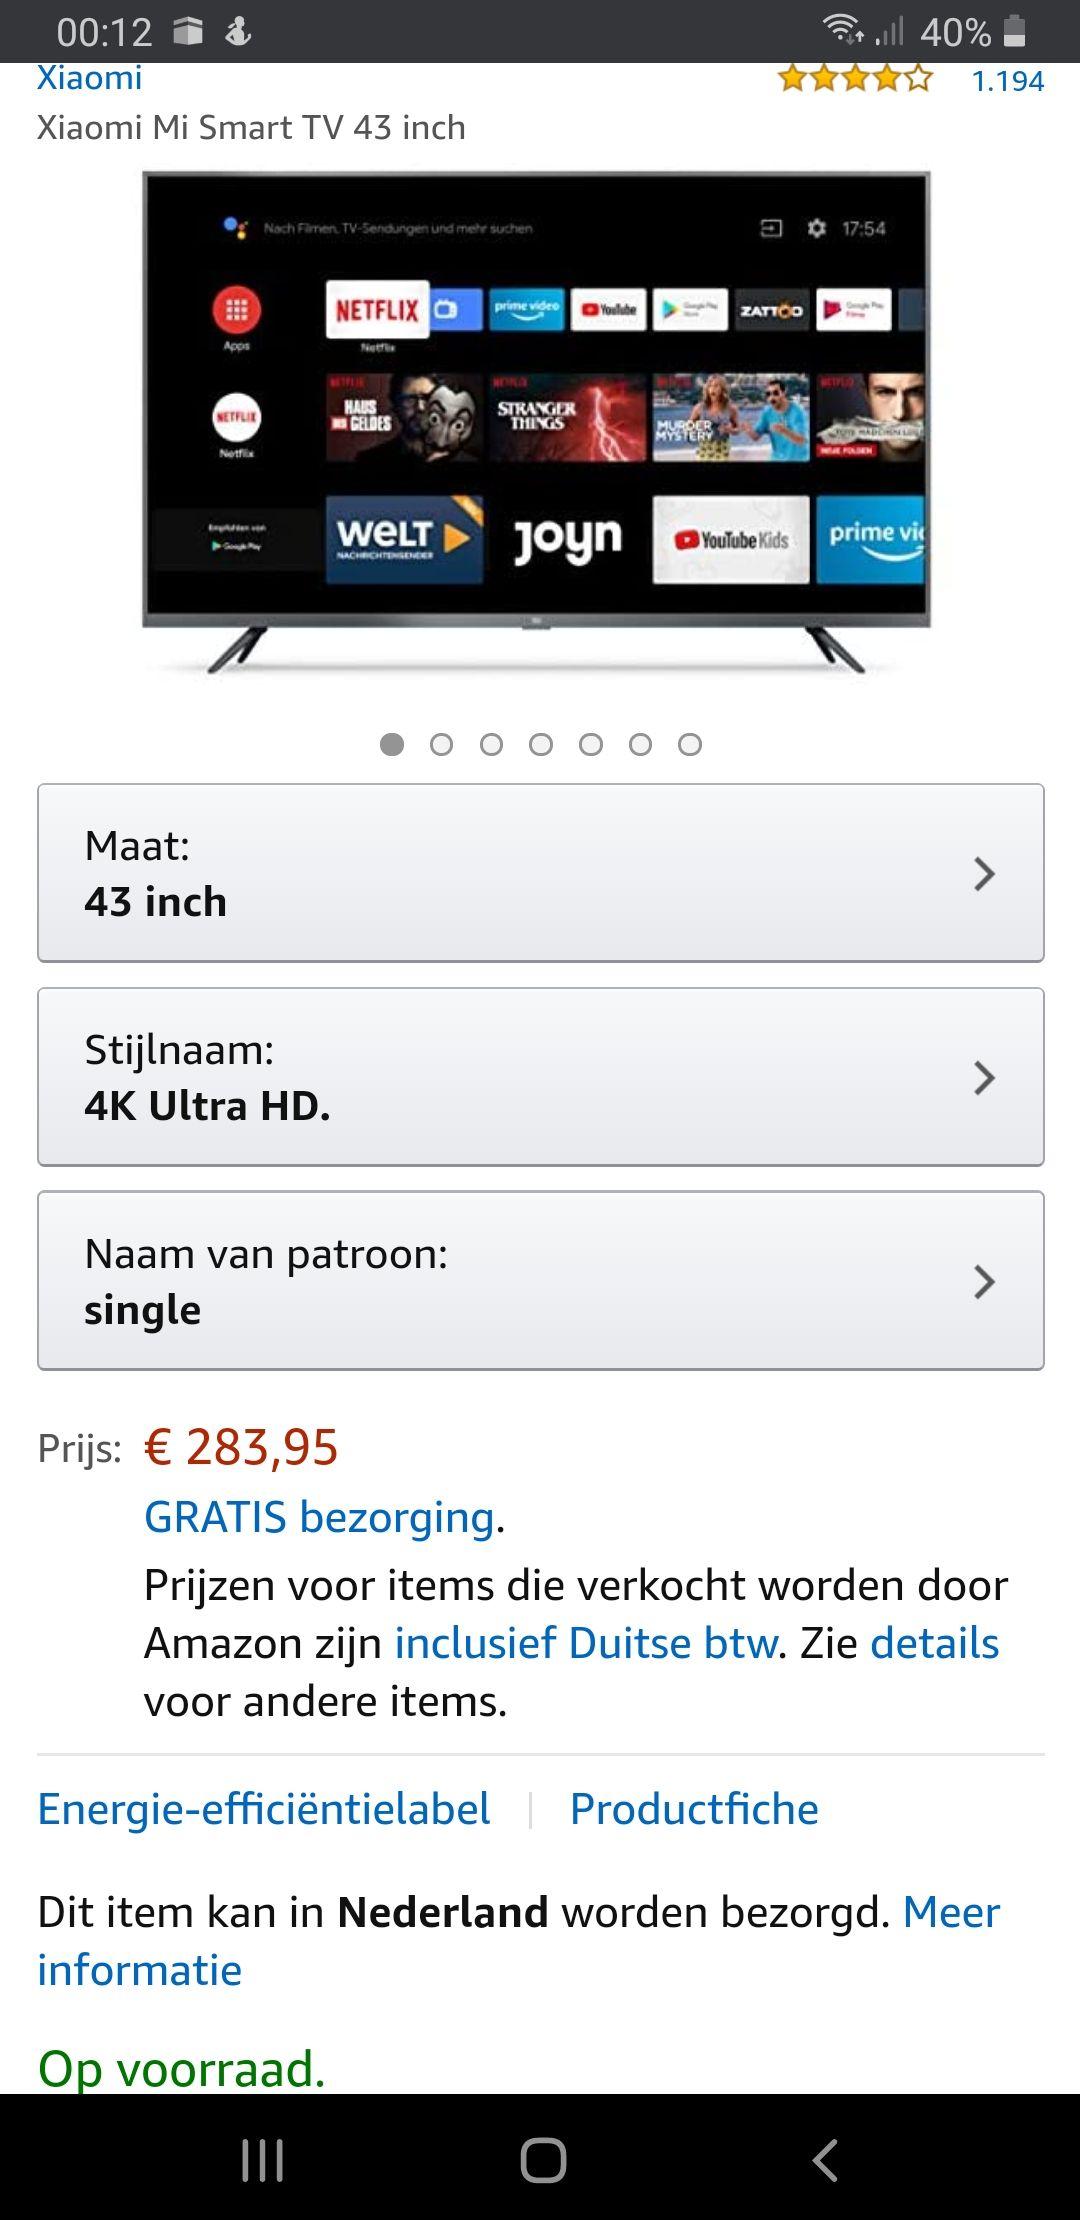 Xiaomi Mi Smart TV 43 inch